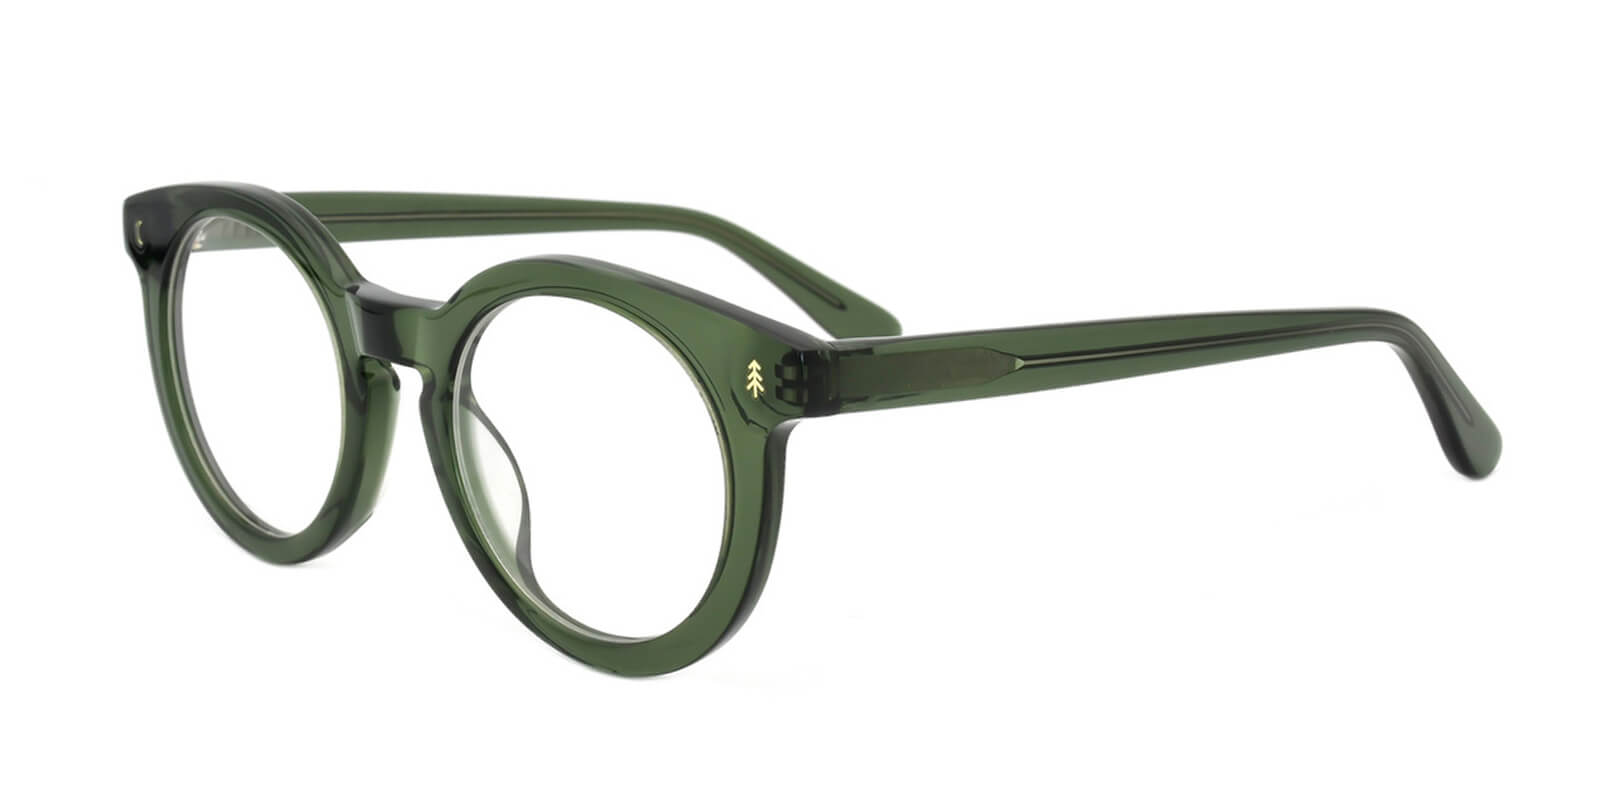 Neptune-Retro round glasses for comfortable wearing